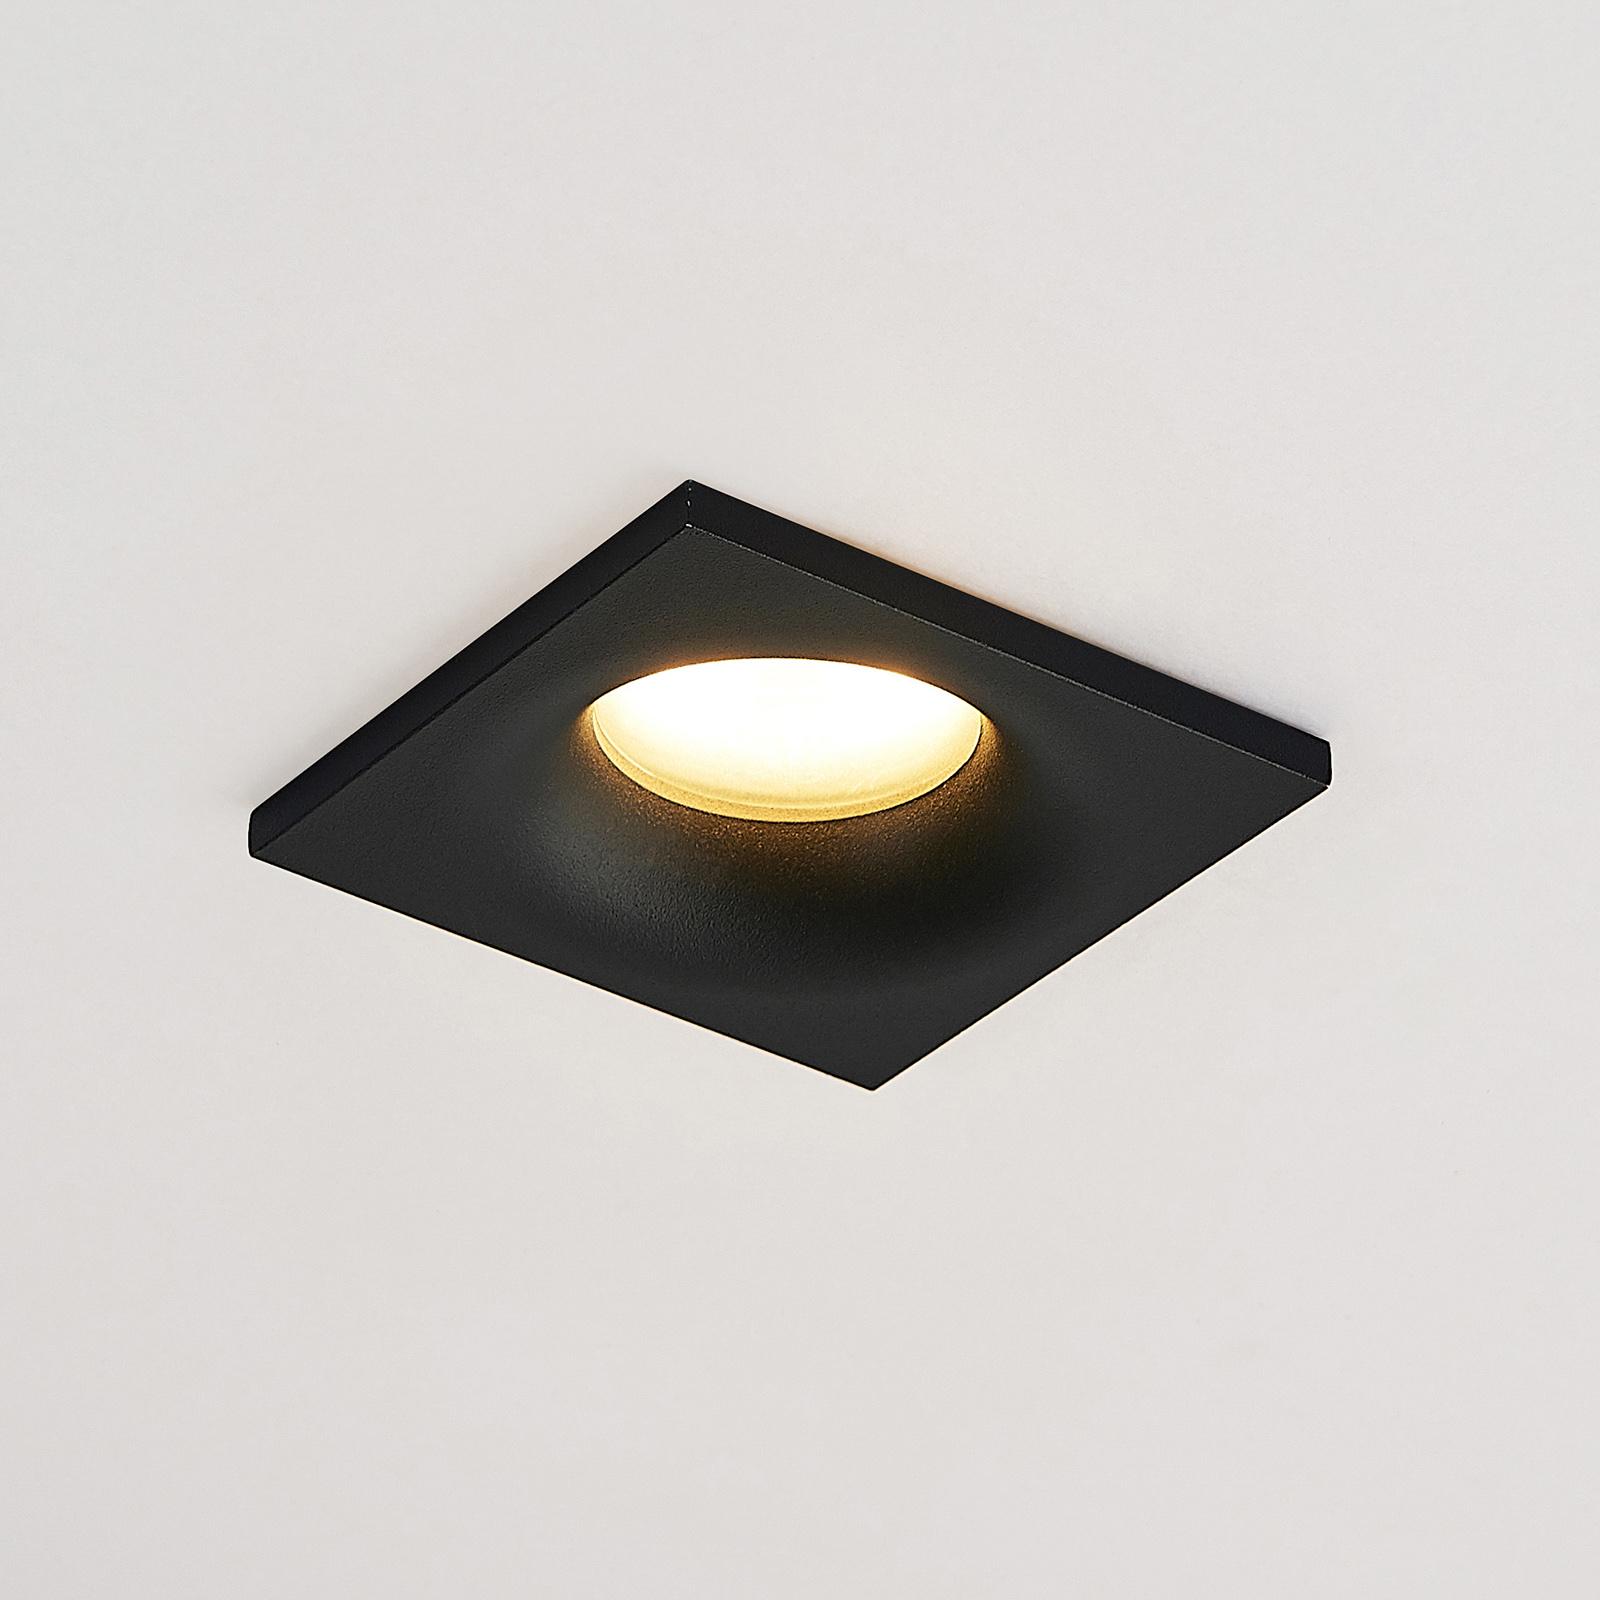 Arcchio Enia zapuštěné světlo, hranaté, černé